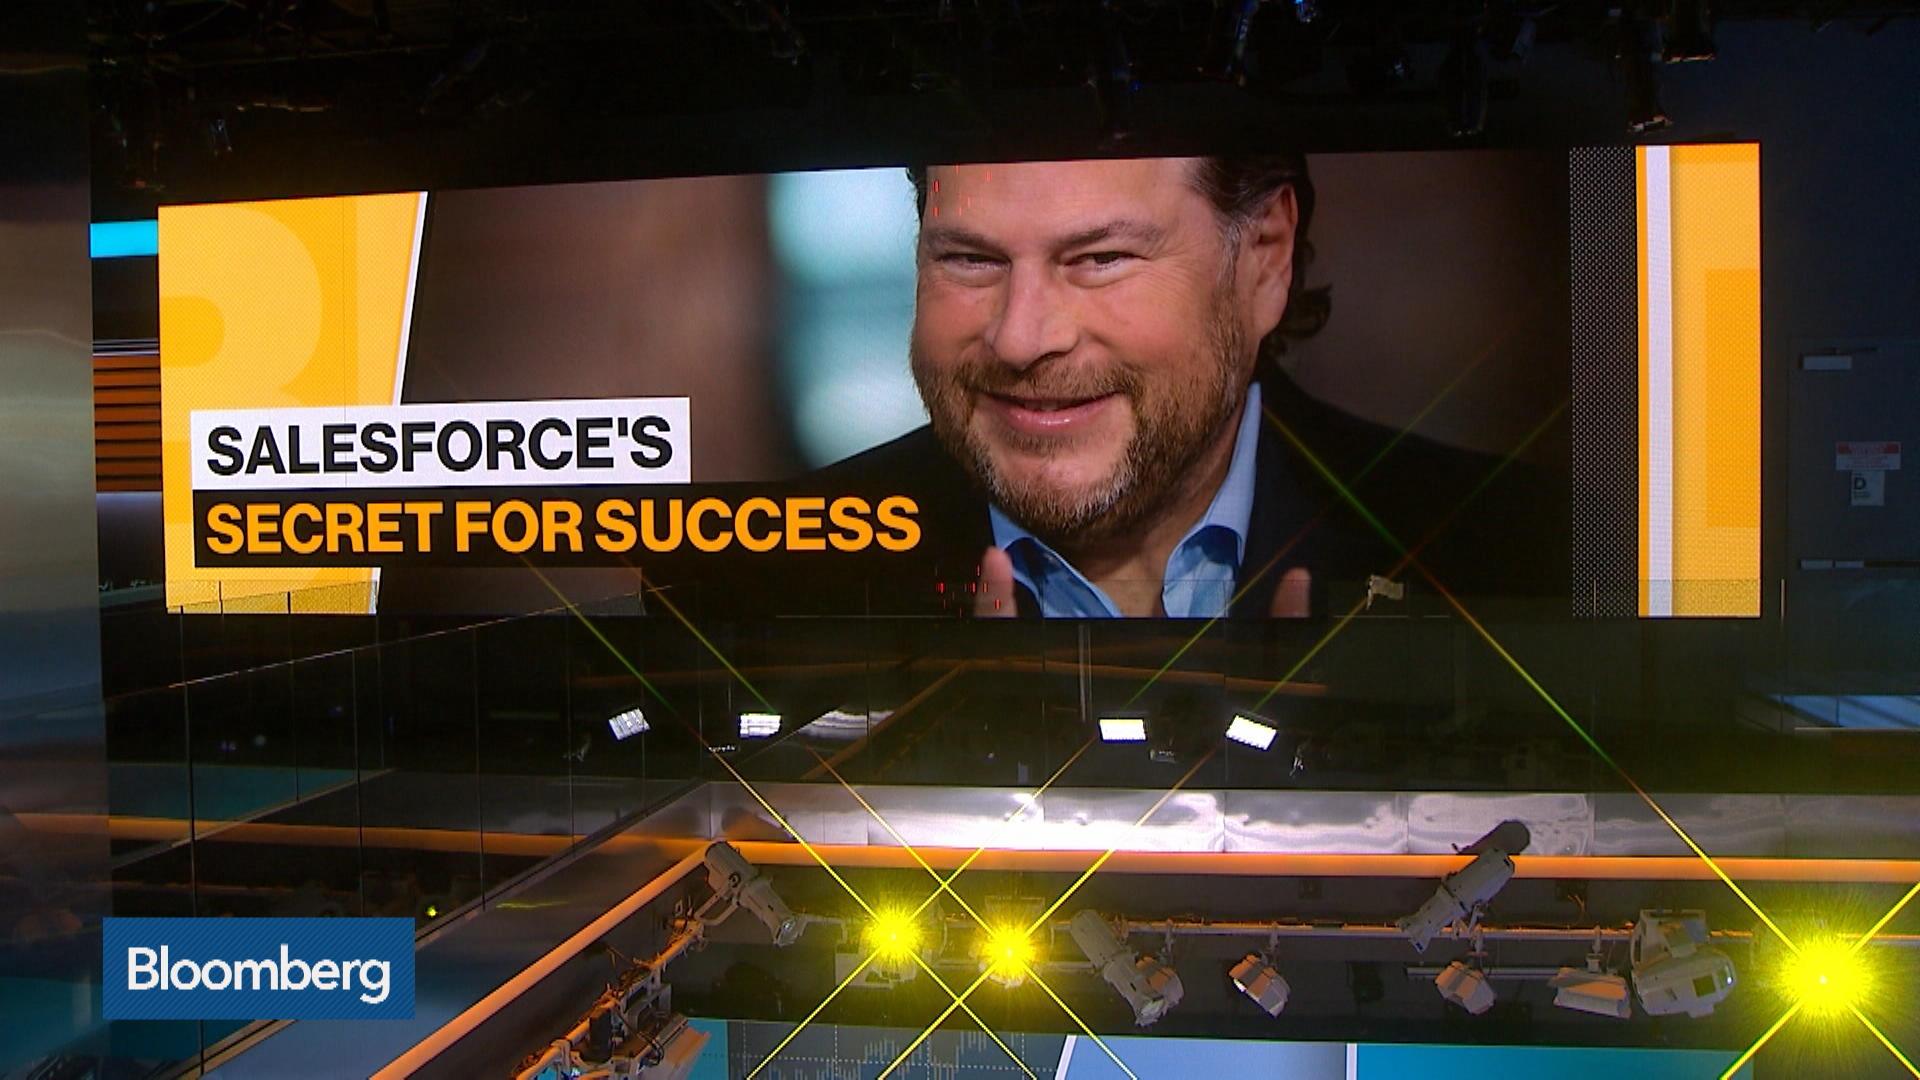 The Secret to Salesforce's Success